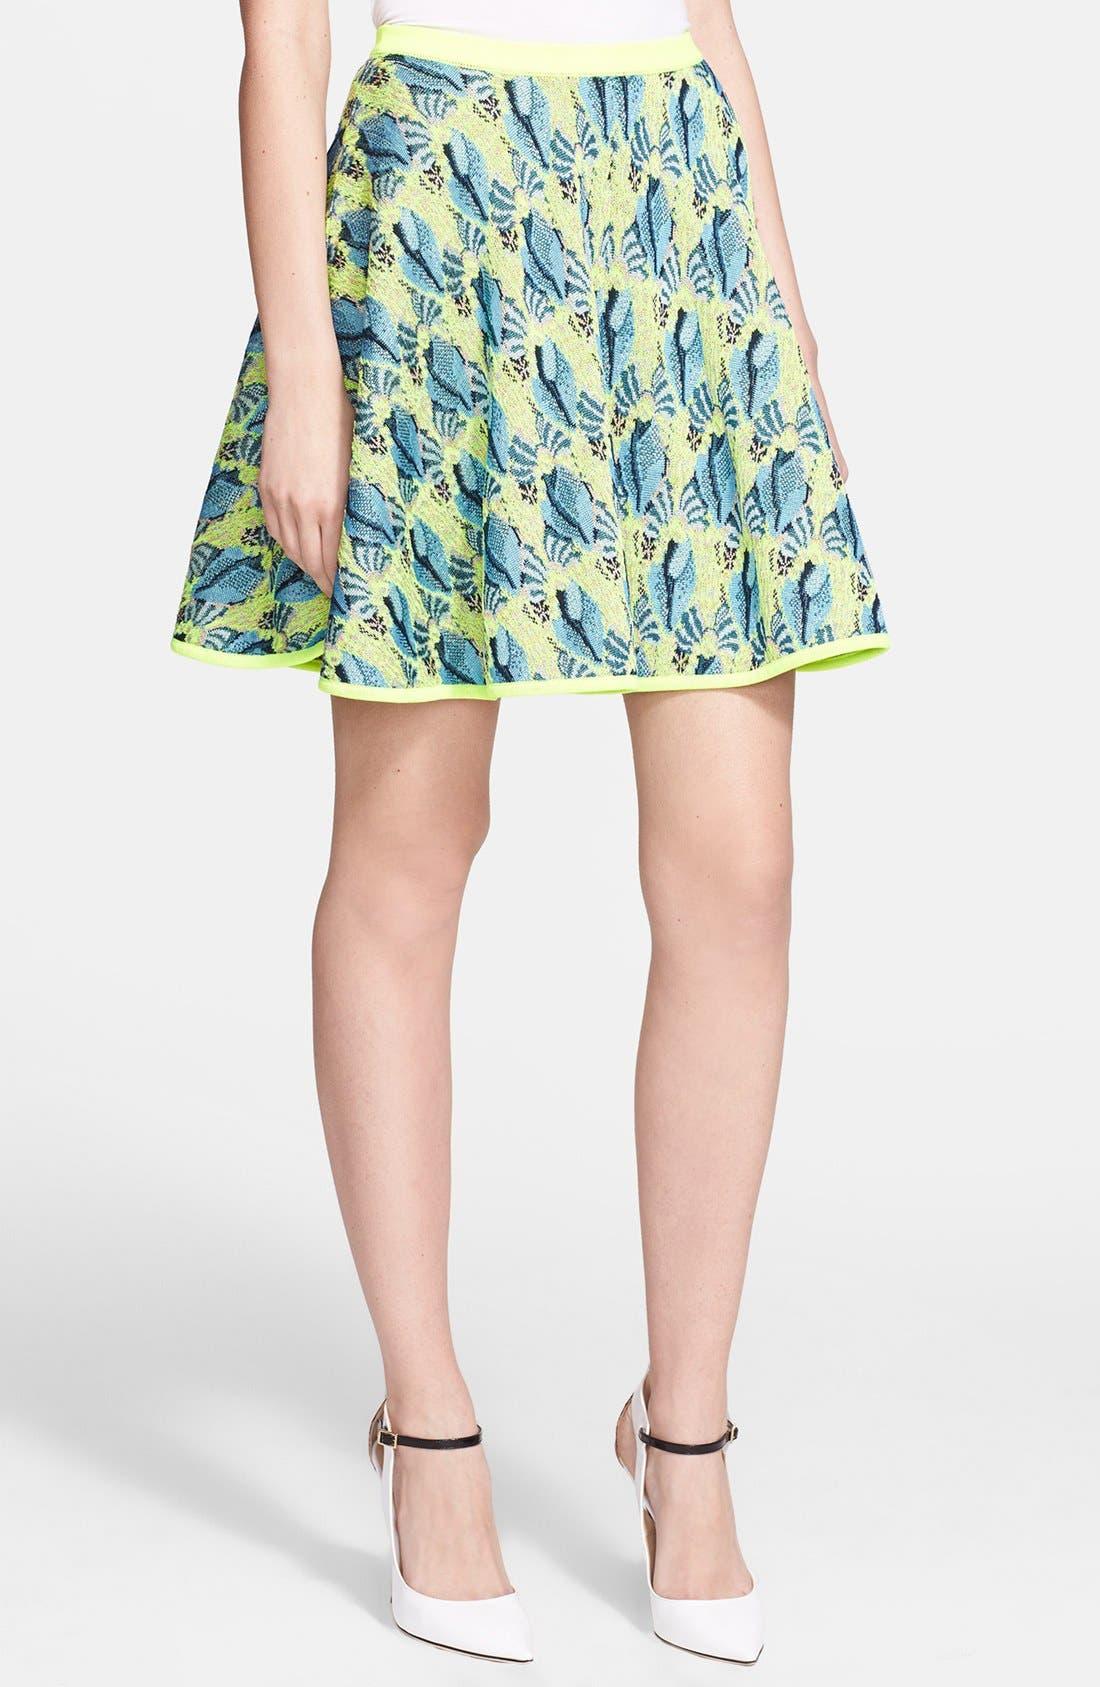 Alternate Image 1 Selected - Mary Katrantzou Jacquard Knit Skirt